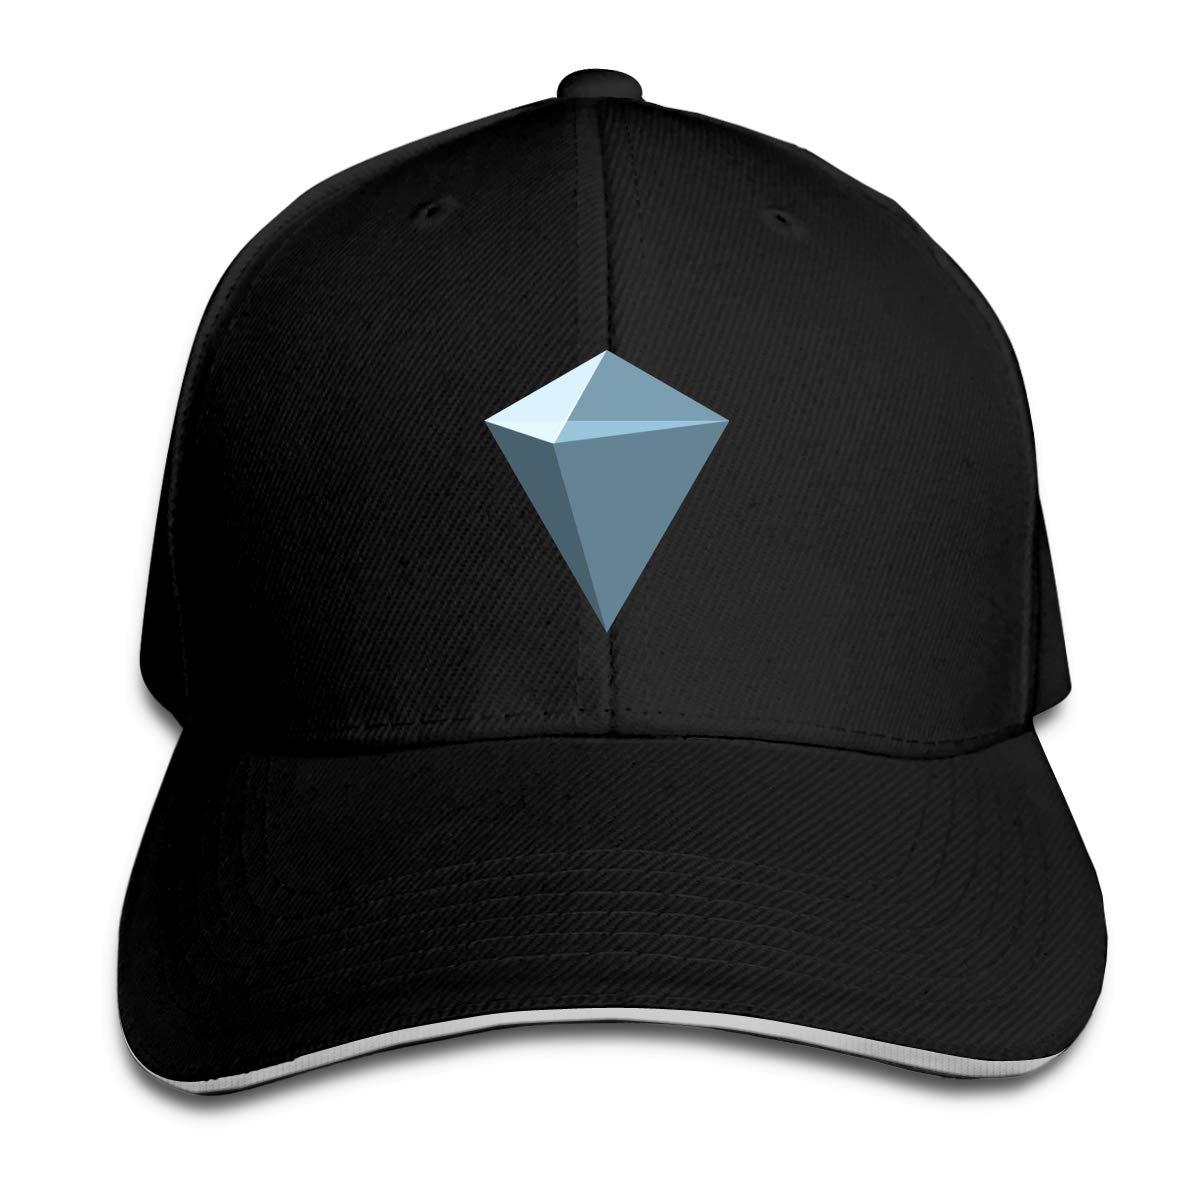 KuCoin Shares Outdoor Snapback Sandwich Cap Adjustable Baseball Hat Hip Hop Hat